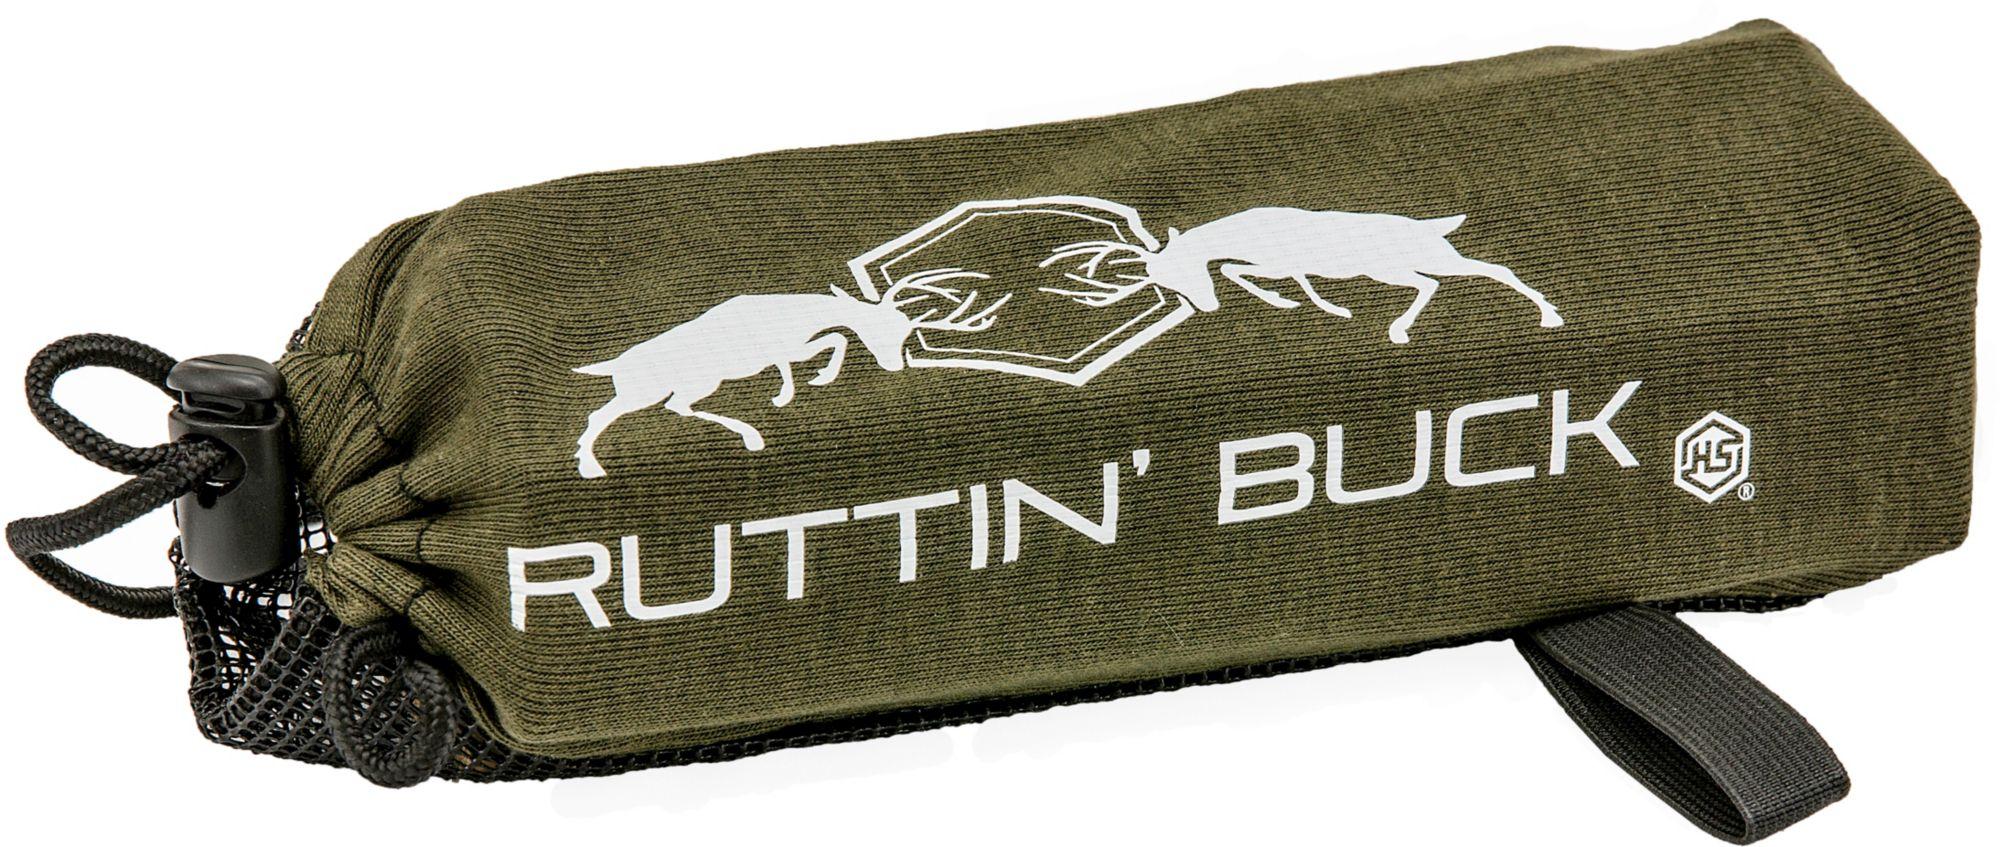 Hunters Specialties Ruttin' Buck Rattling Bag Deer Call, Adult Unisex thumbnail